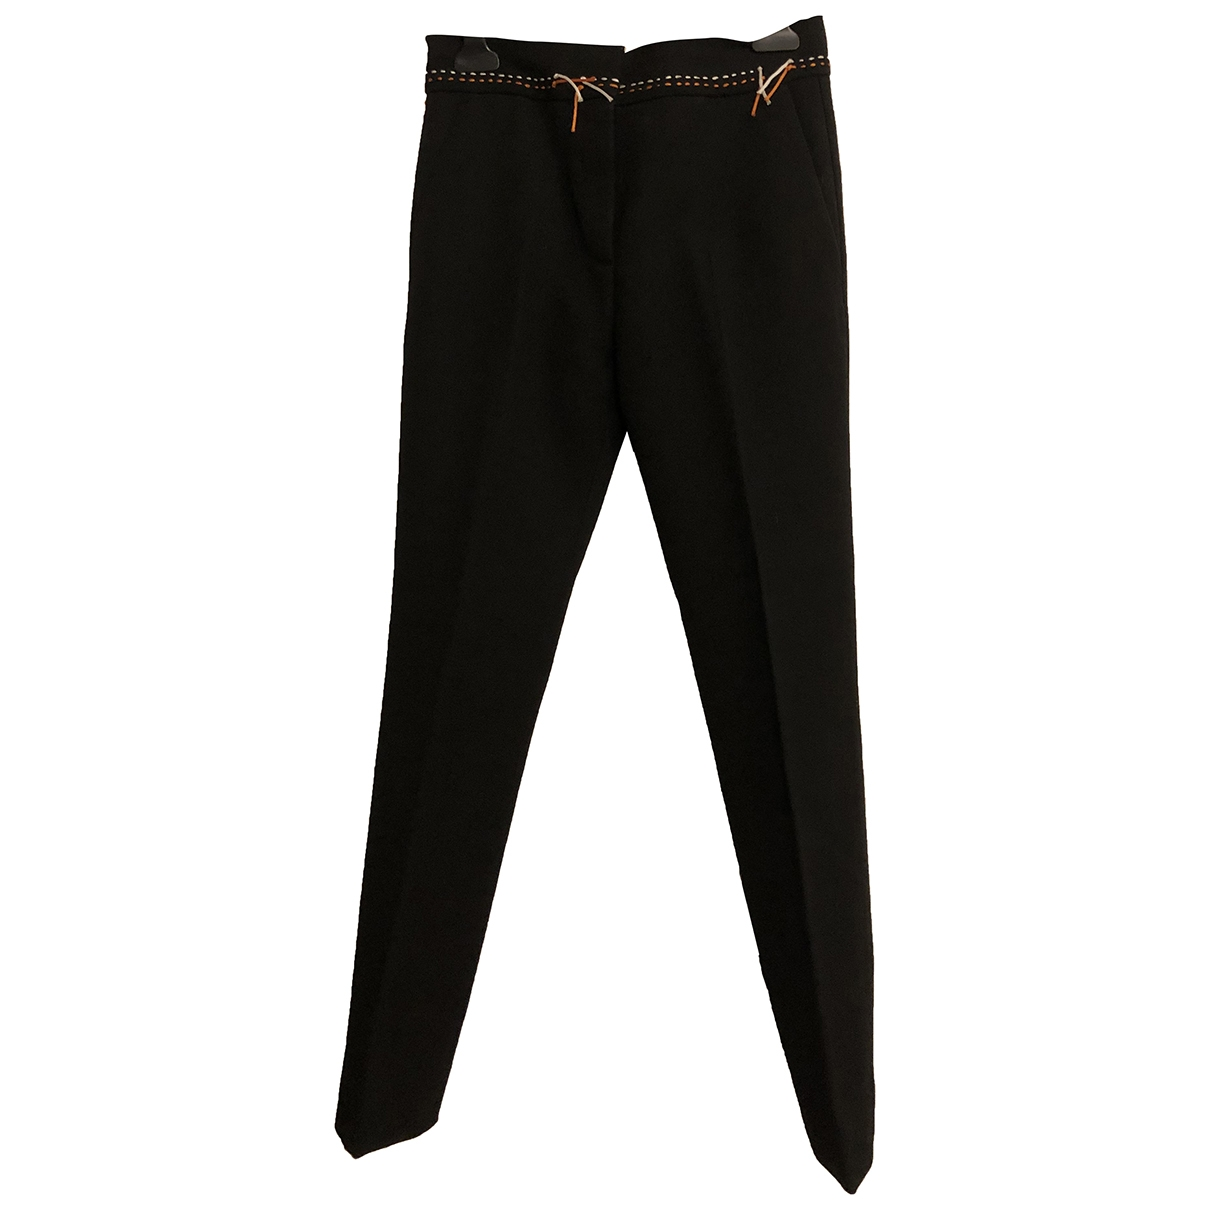 Victoria Beckham \N Black Wool Trousers for Women 36 FR